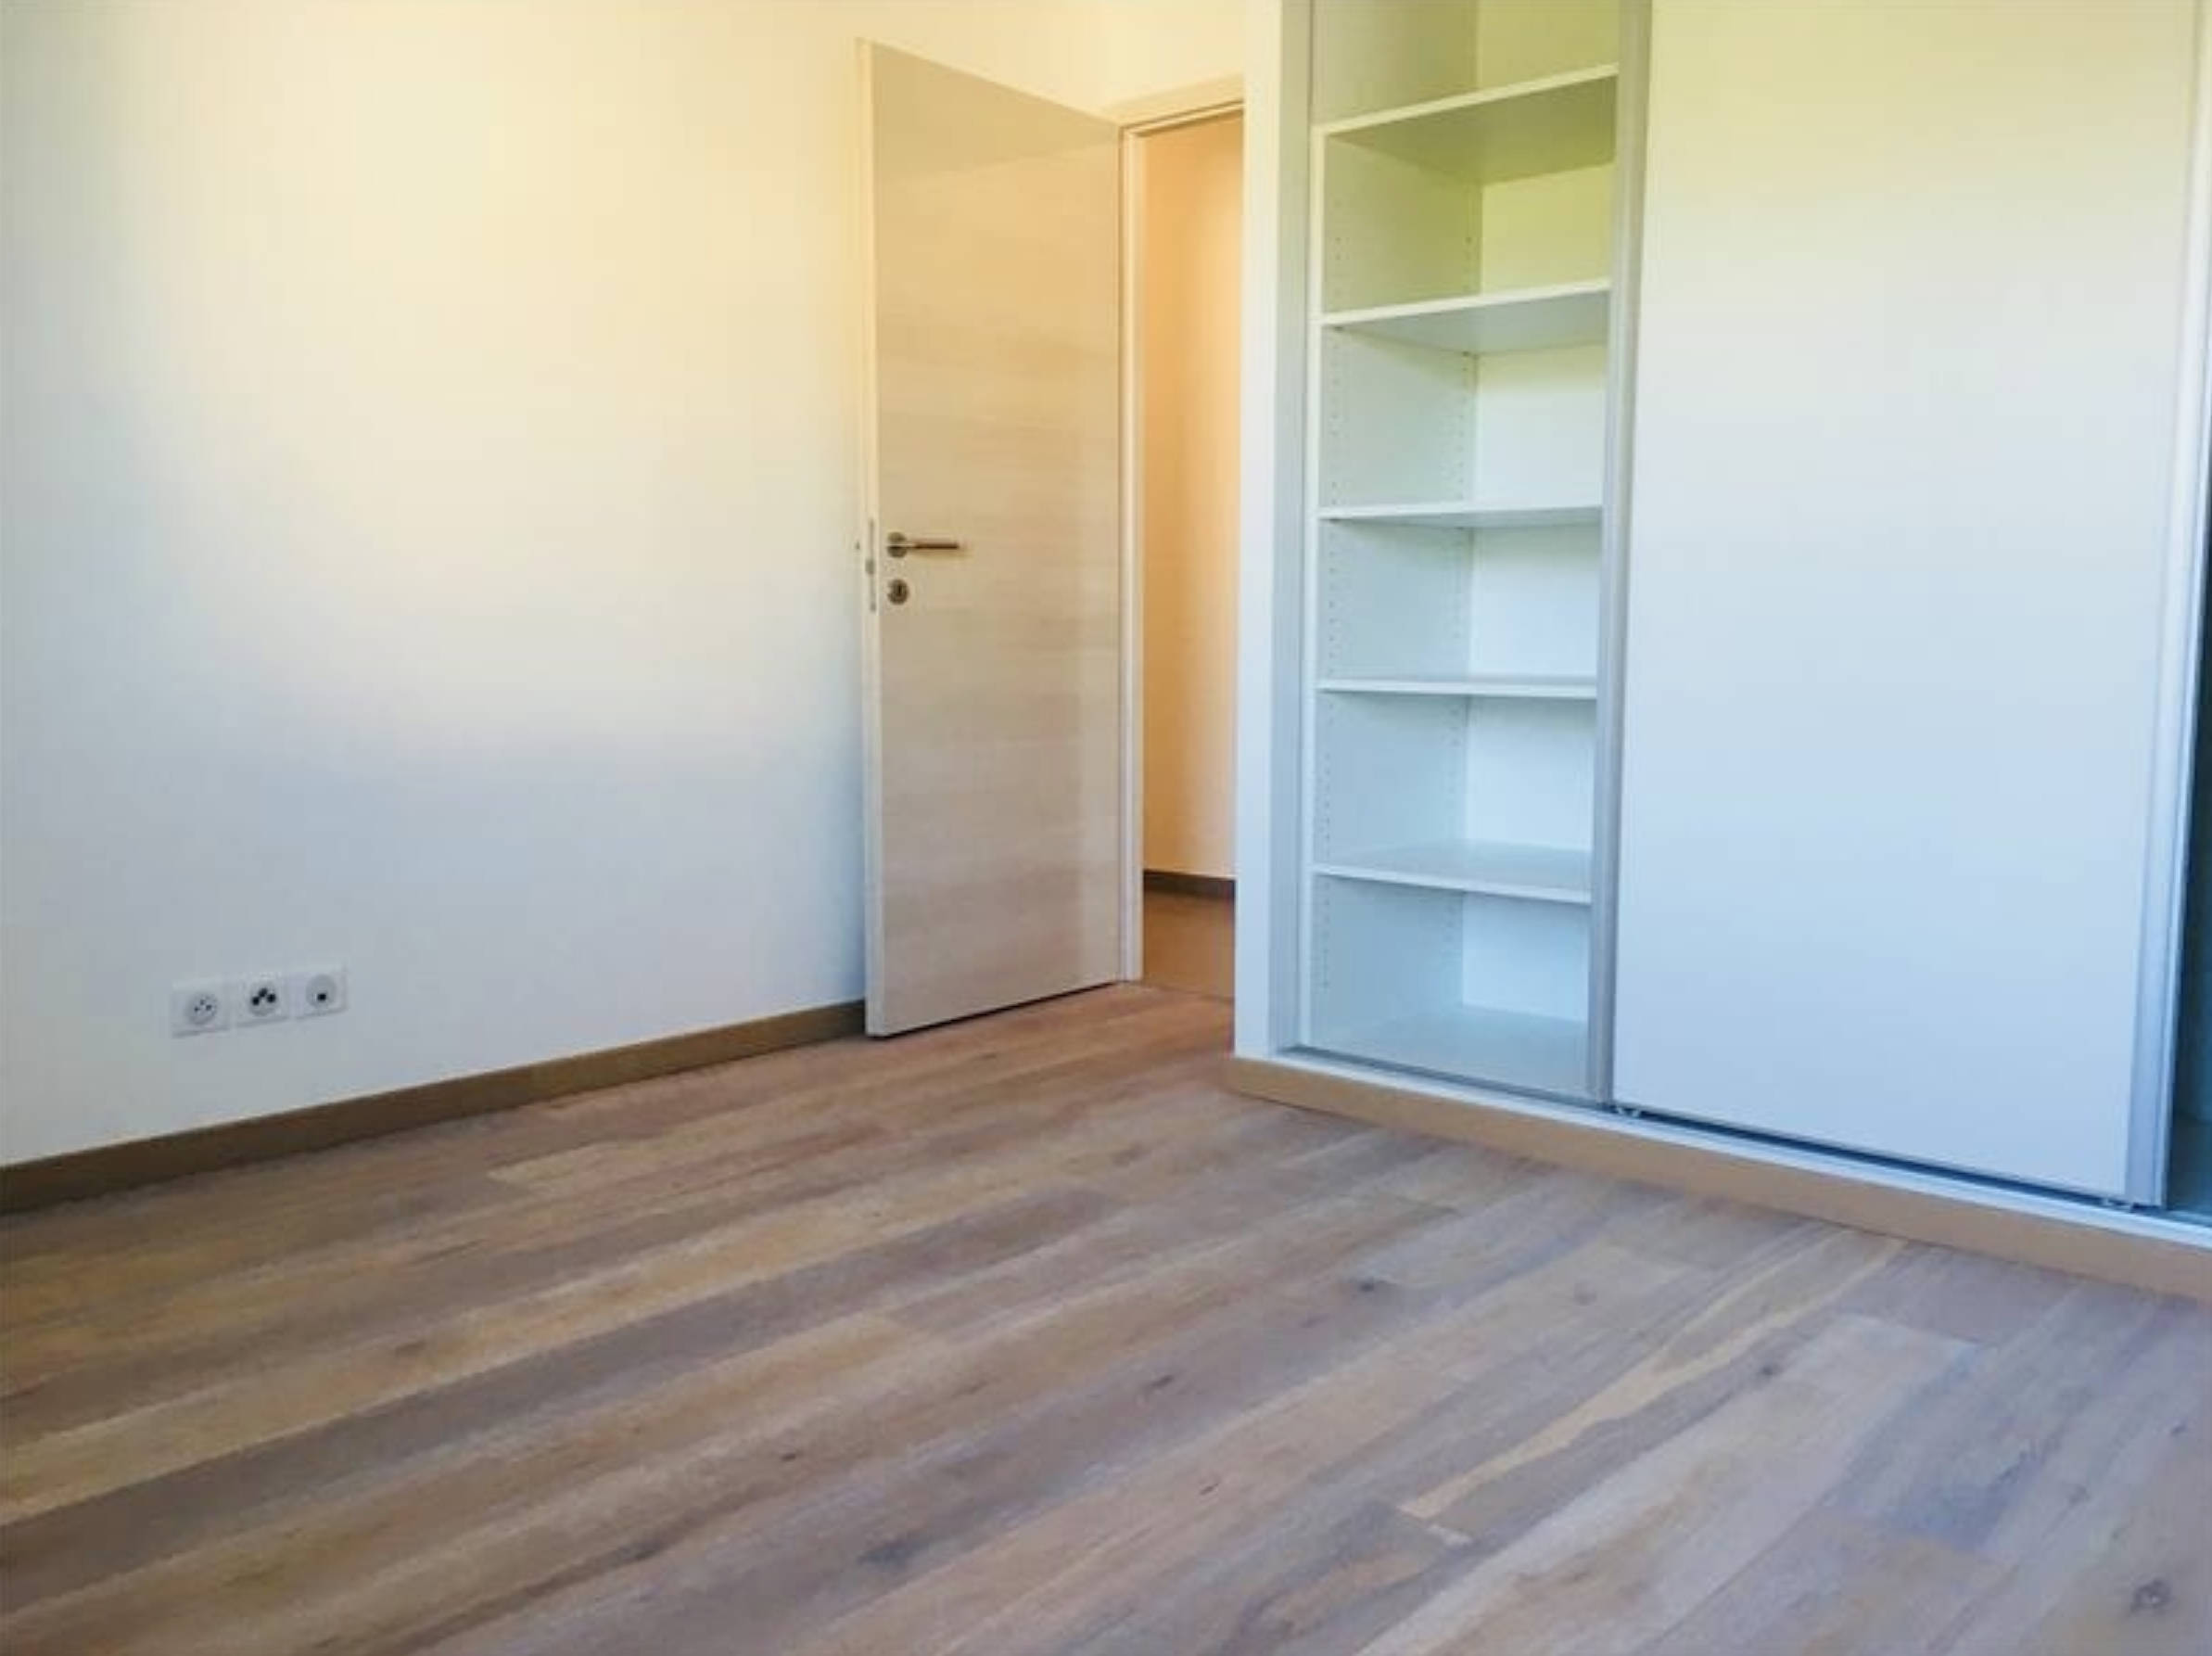 Агентство недвижимости в Эвиане Evian